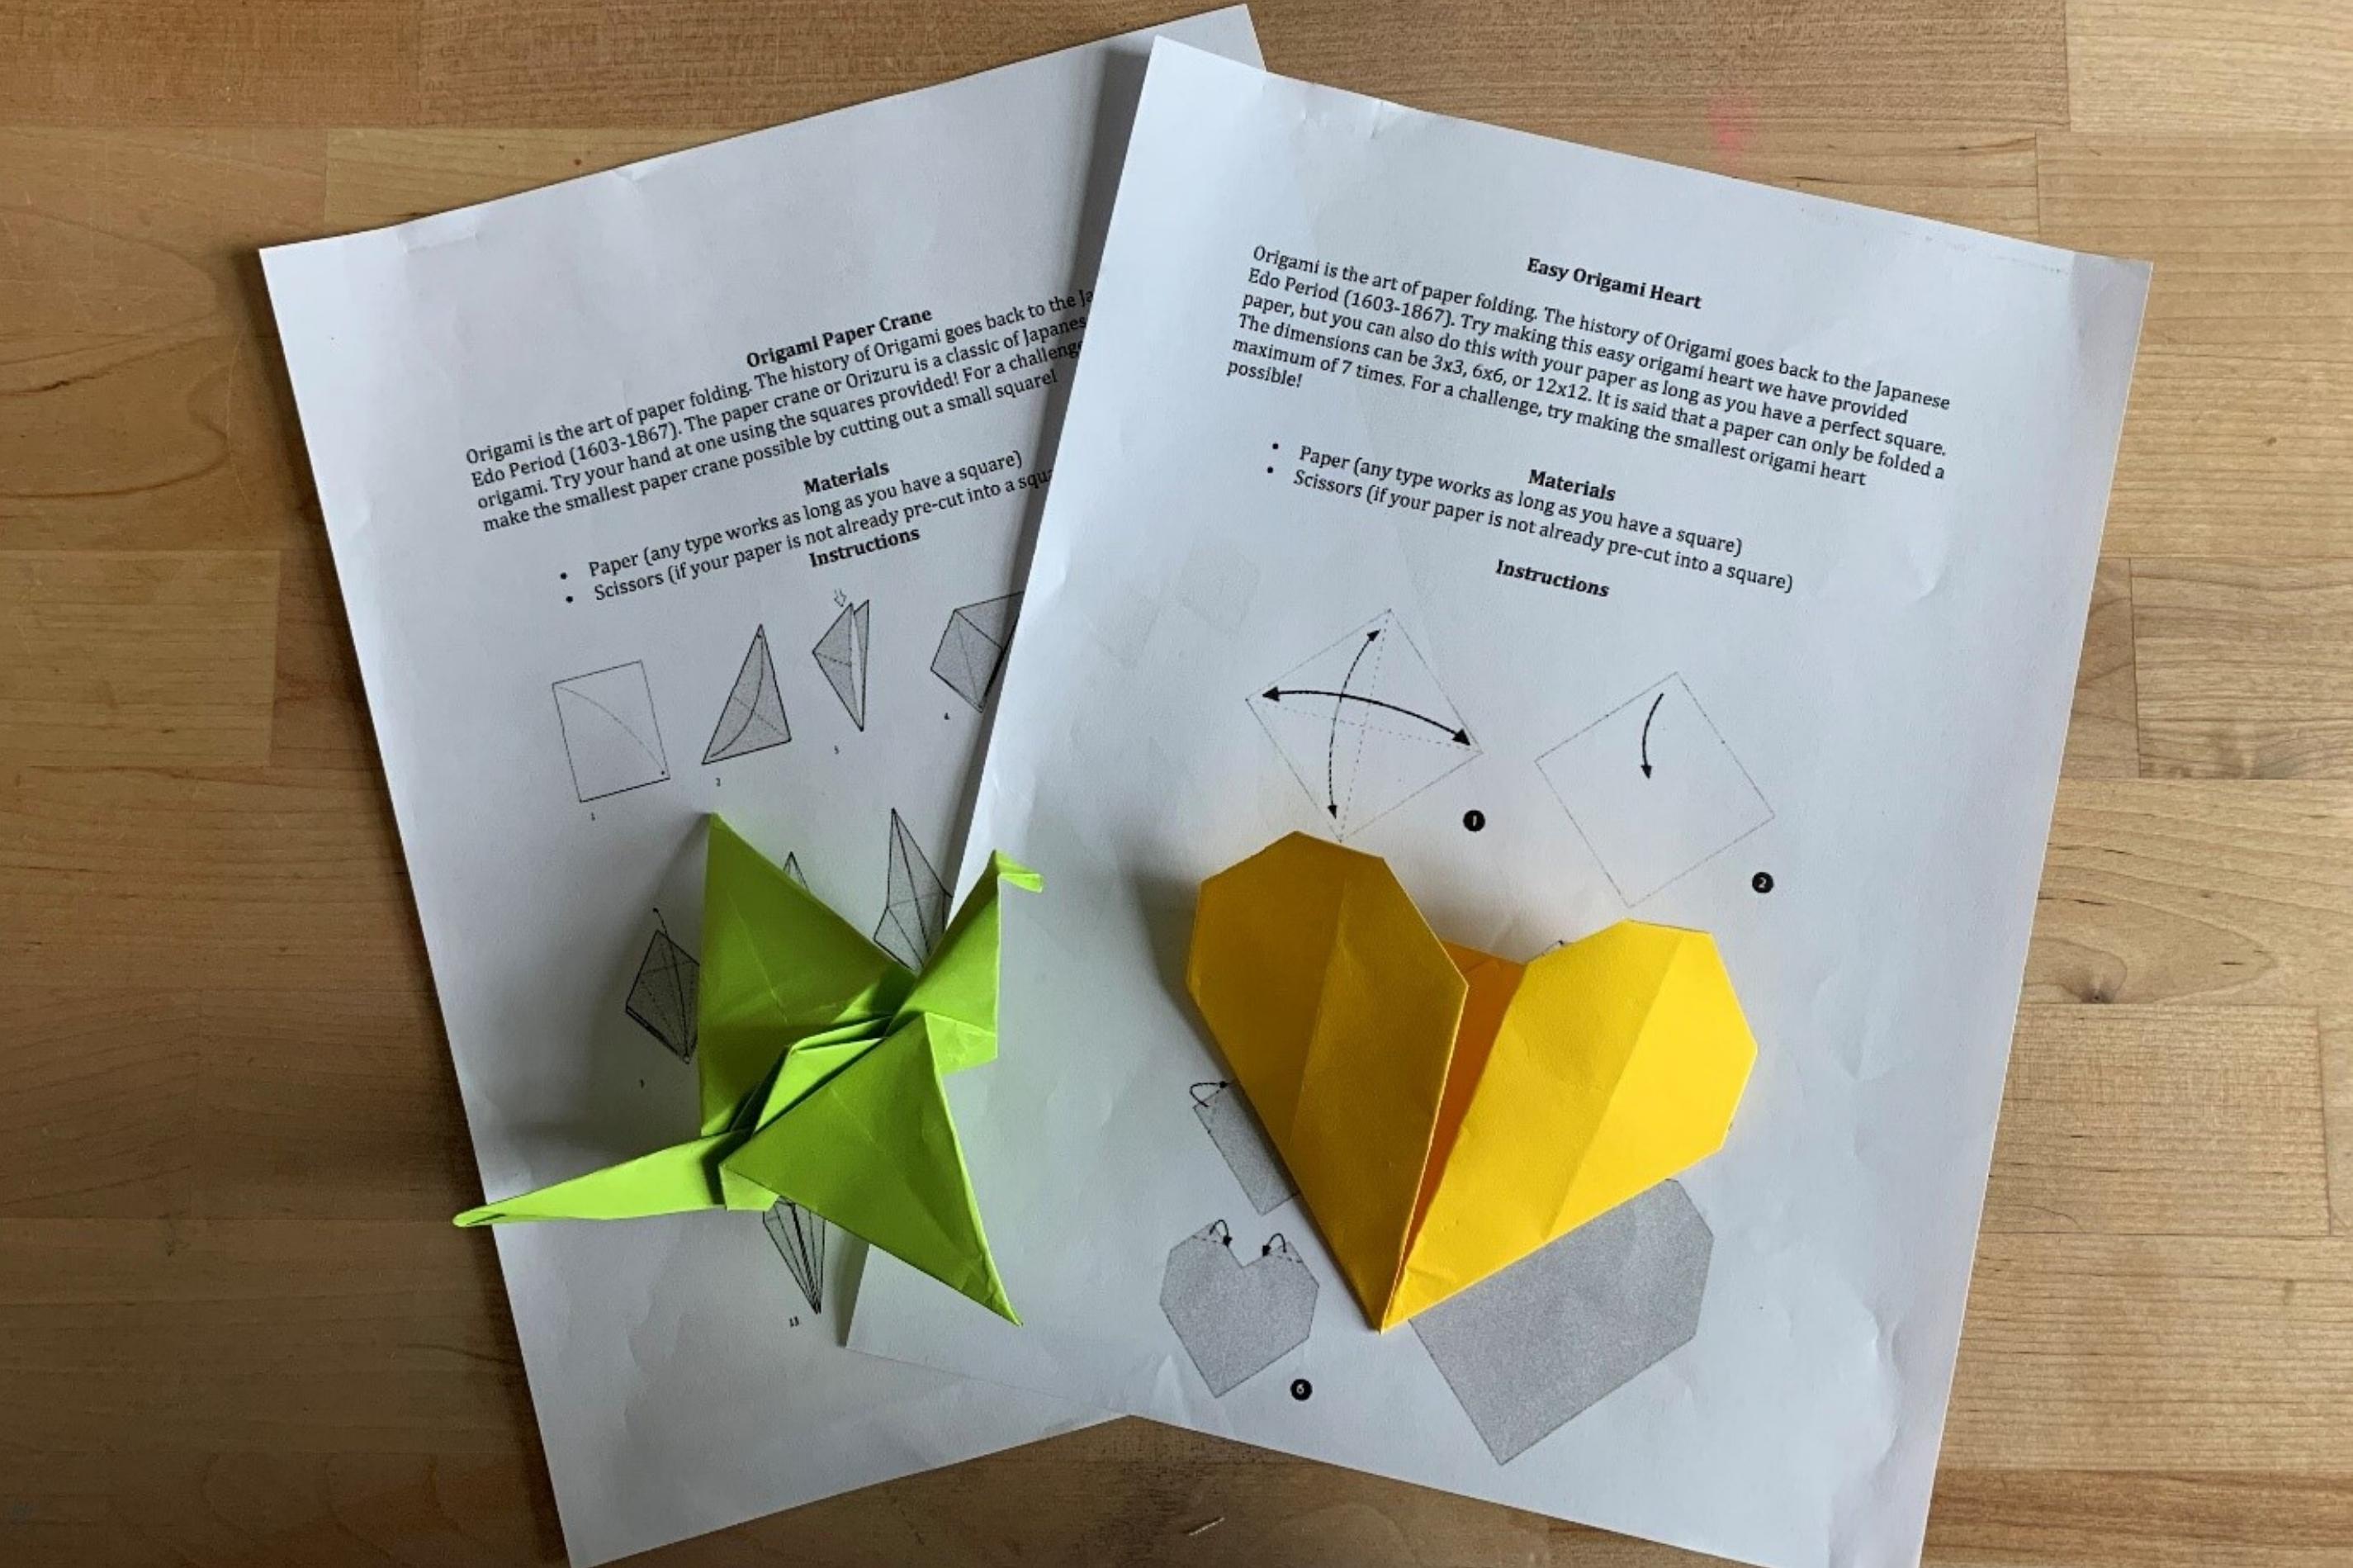 Arts and Crafts: Origami Heart & Paper Crane